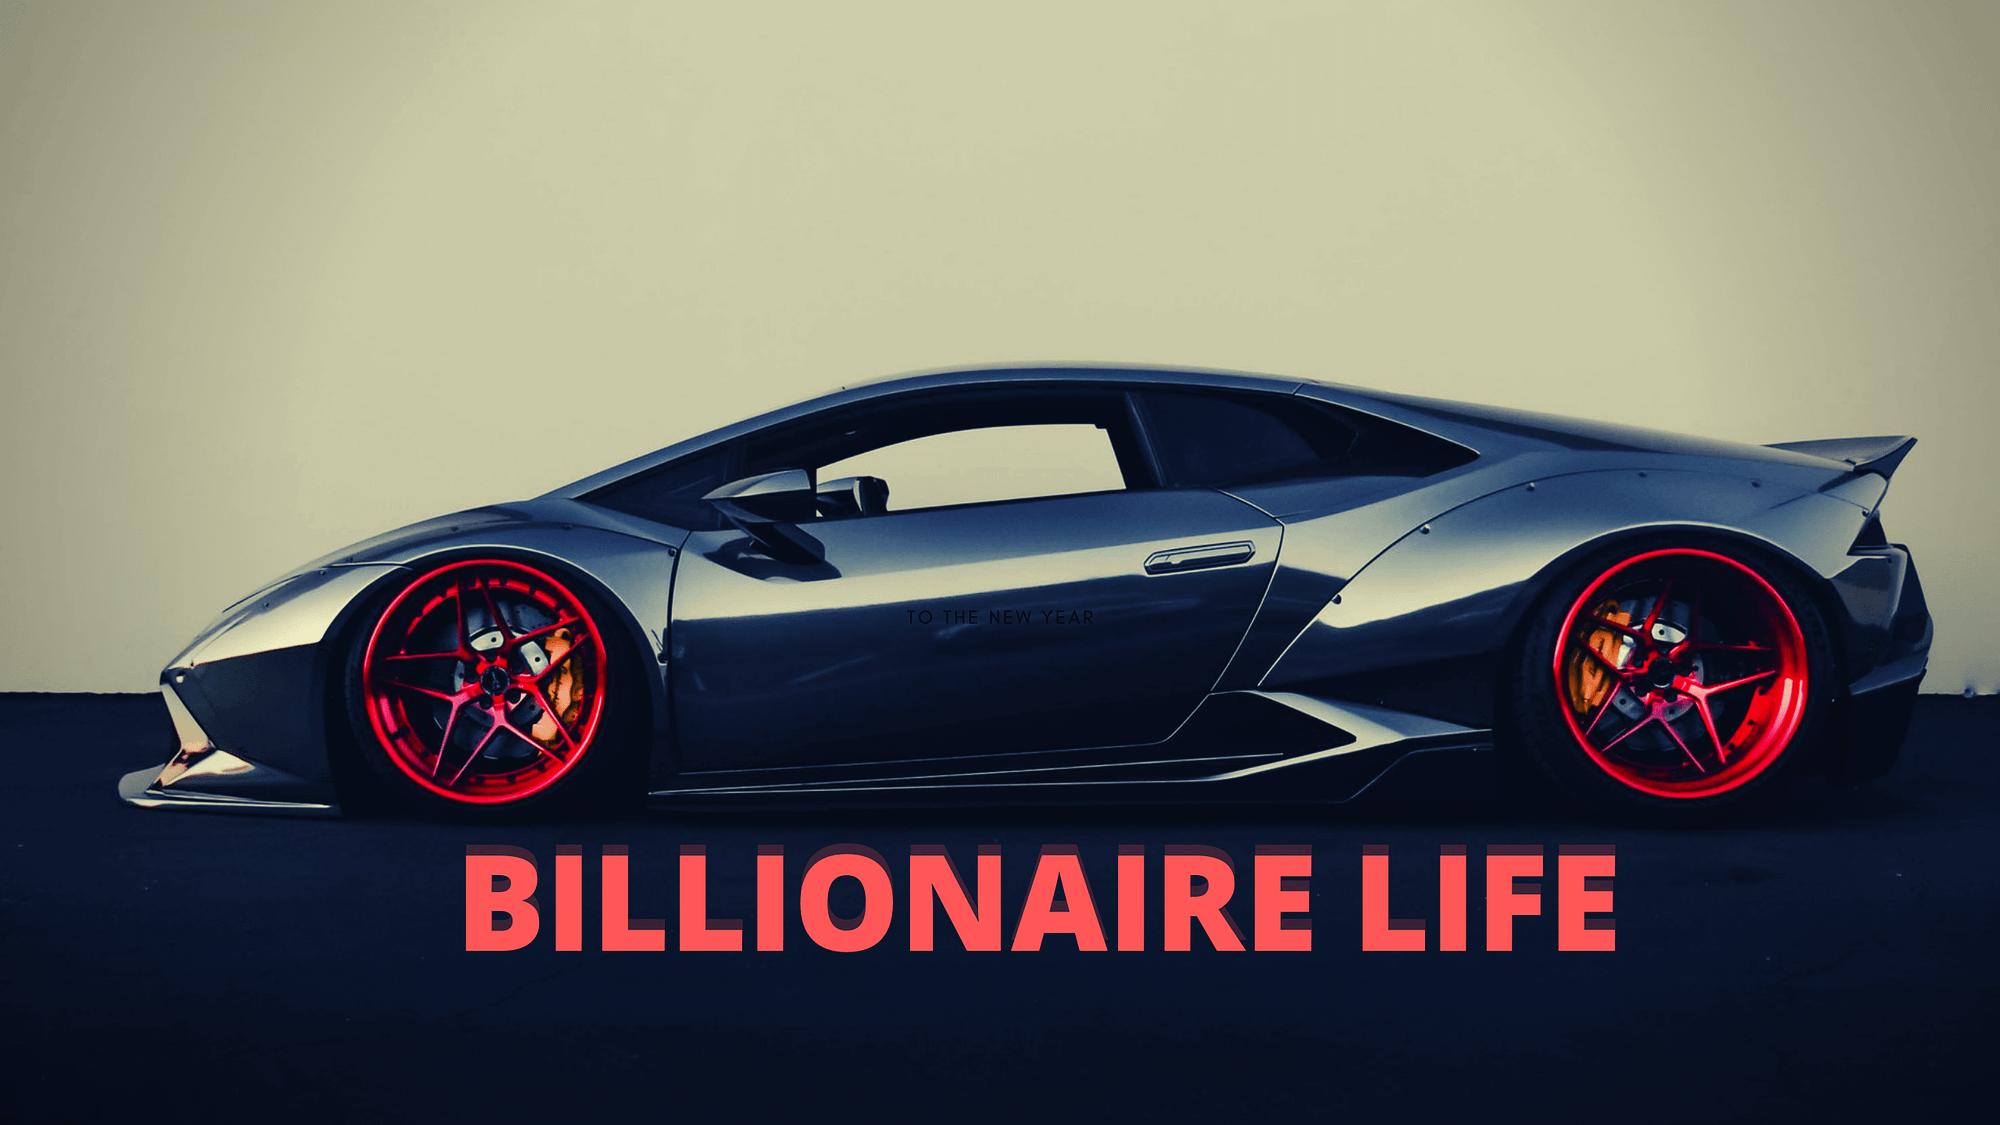 Billionaire Lifestyle